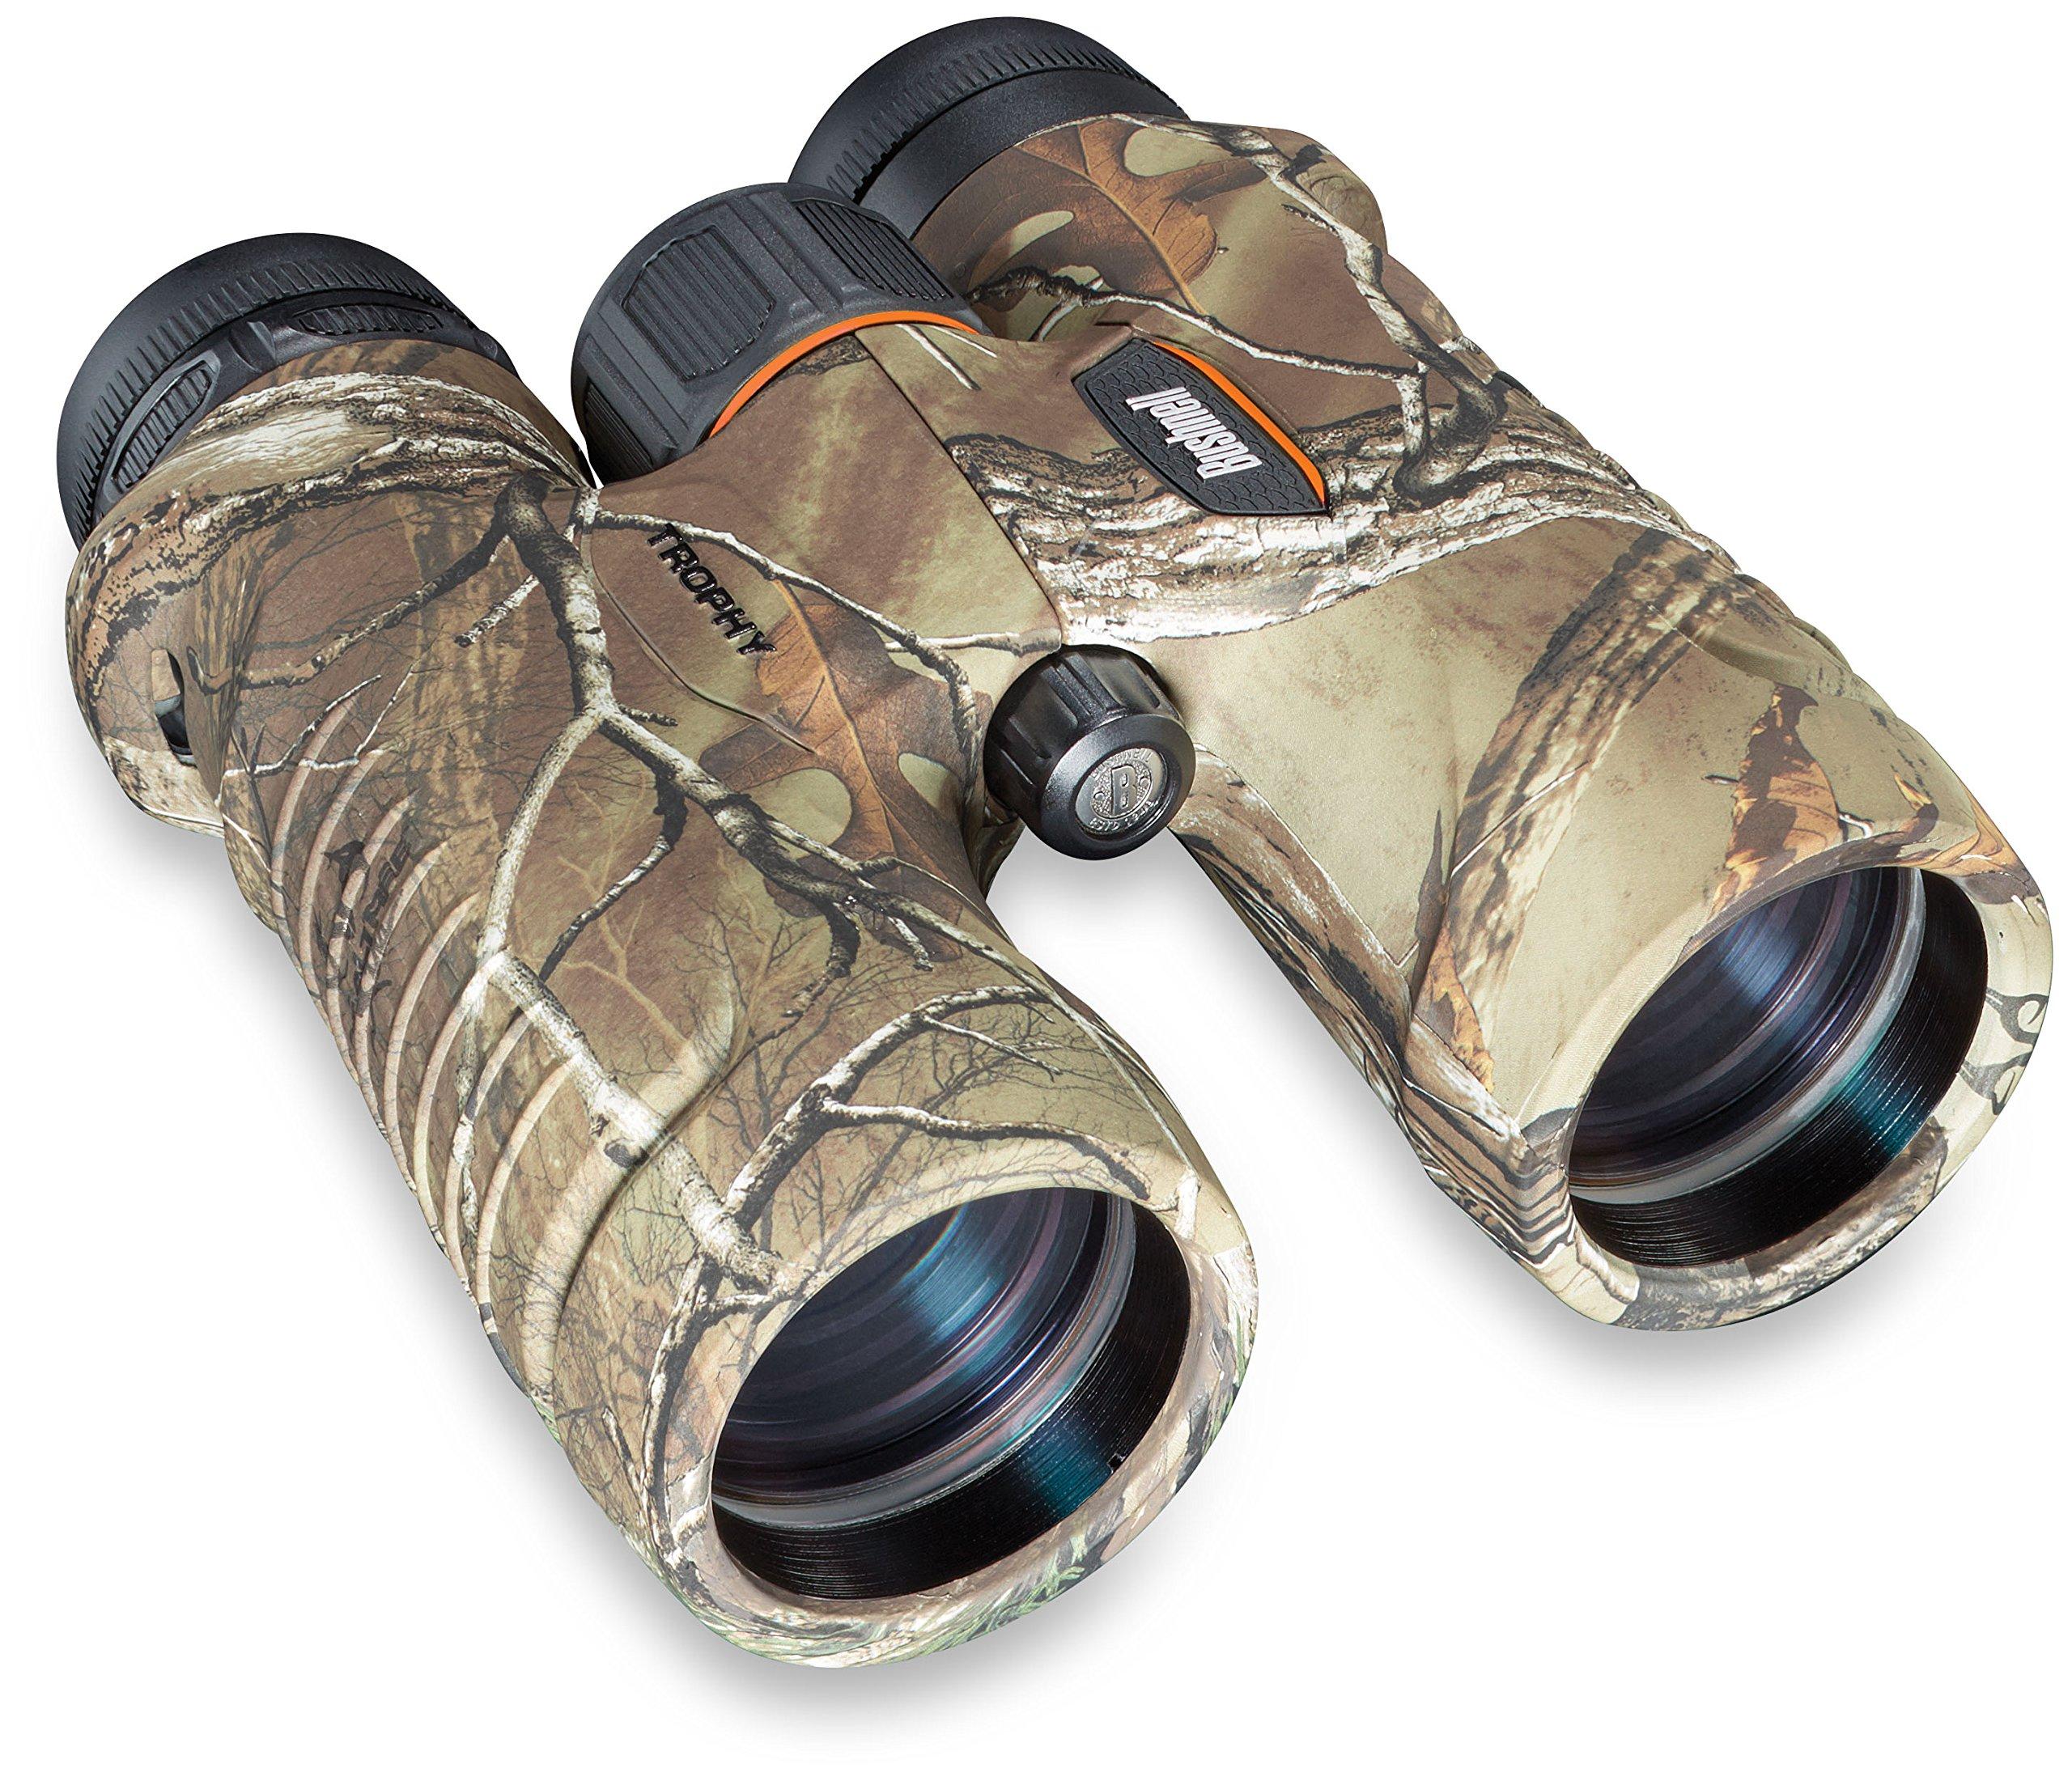 Bushnell 334211 Trophy Binocular, Realtree Xtra, 10 x 42mm by Bushnell